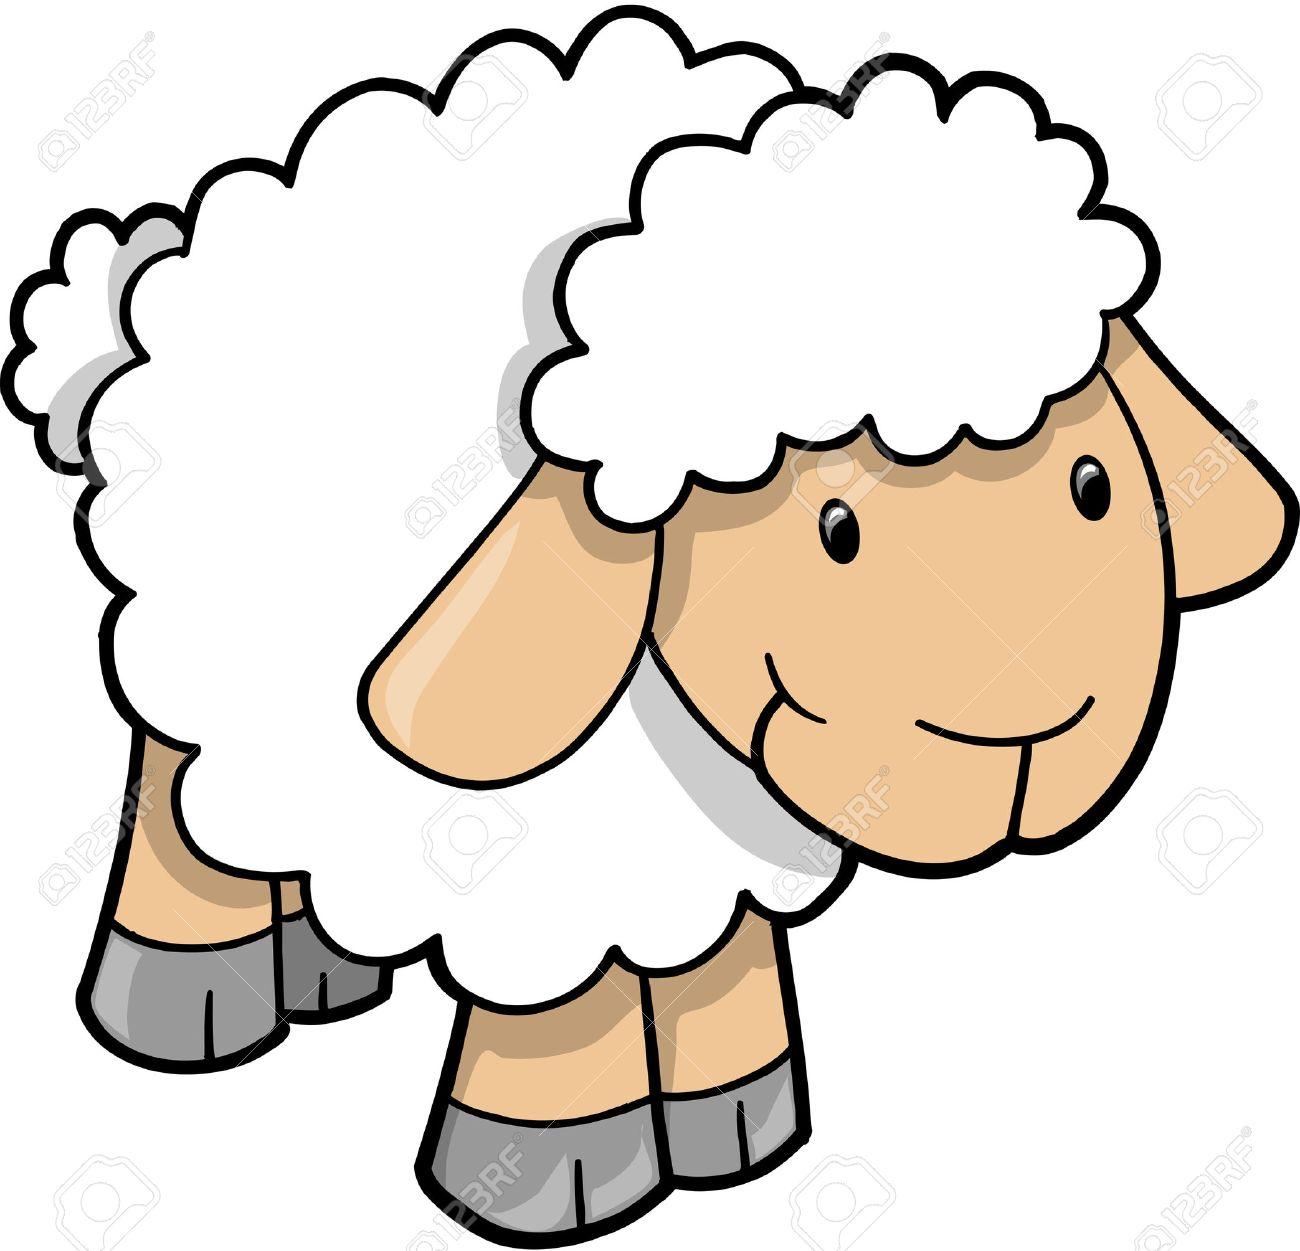 sheep vector illustration royalty free cliparts vectors and stock rh 123rf com sheep vector image sheep vector line